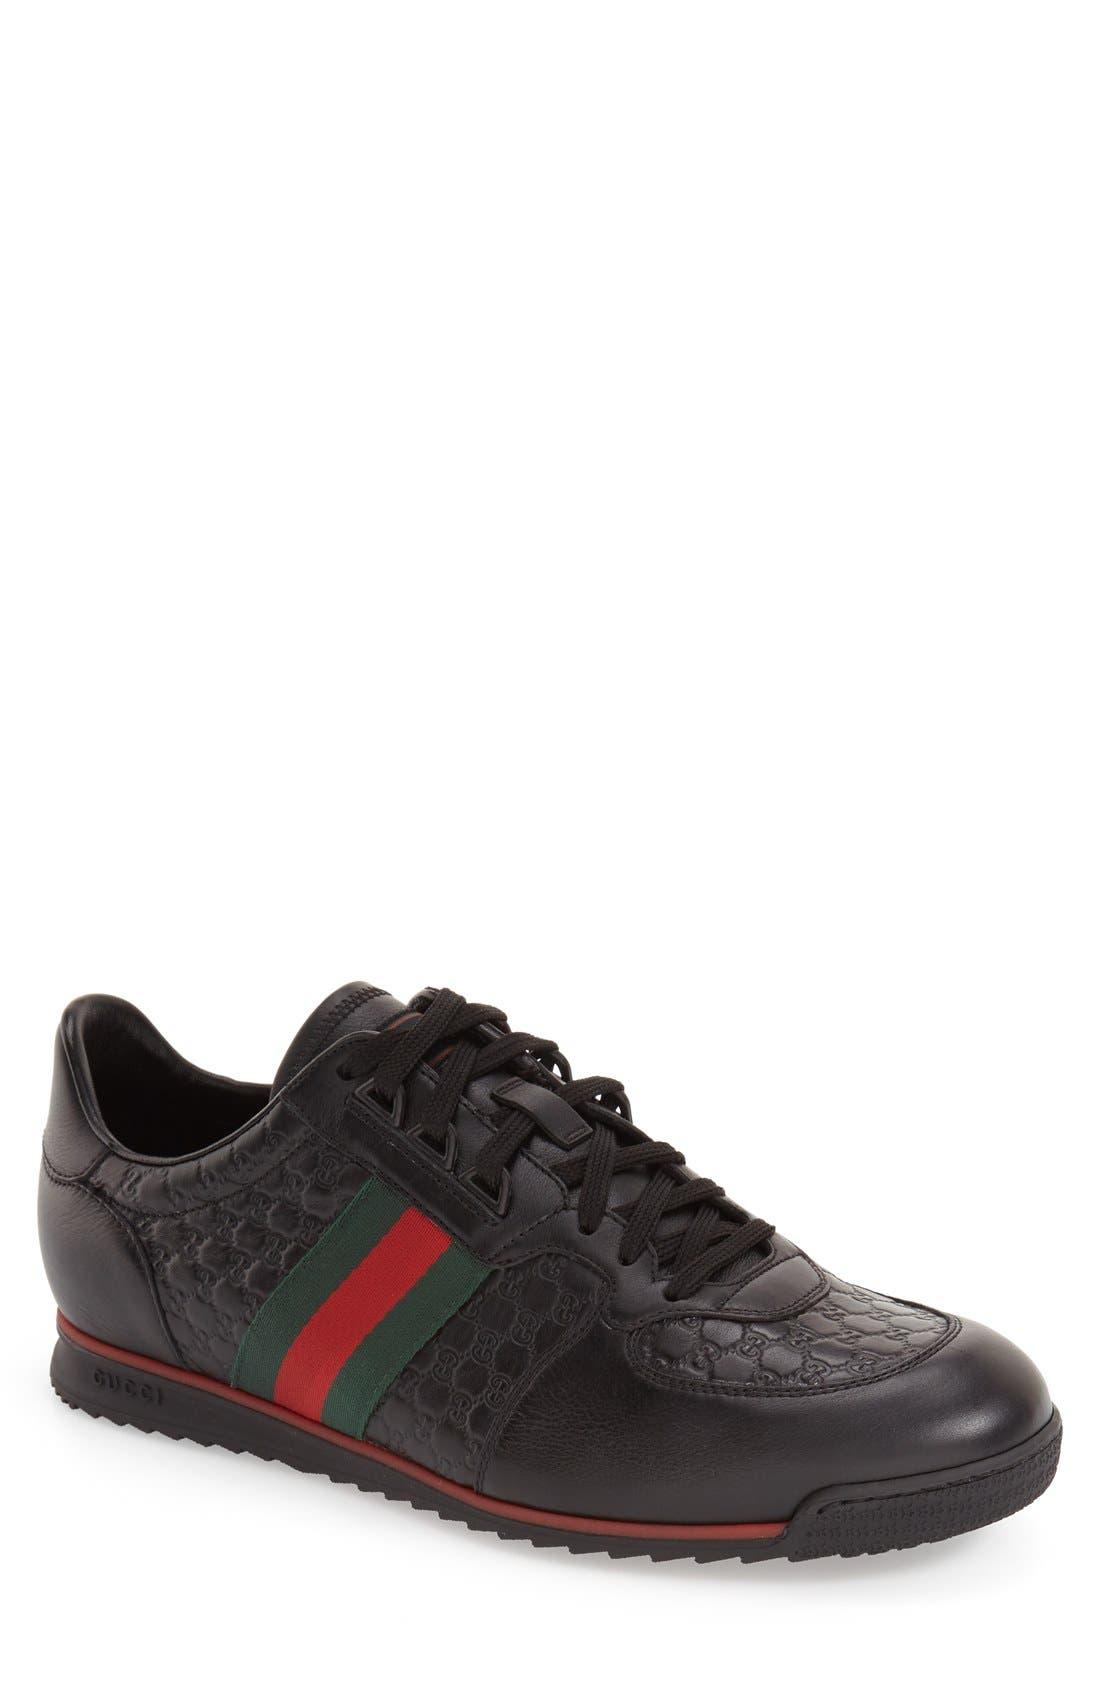 SL 73 Sneaker,                             Main thumbnail 1, color,                             BLACK